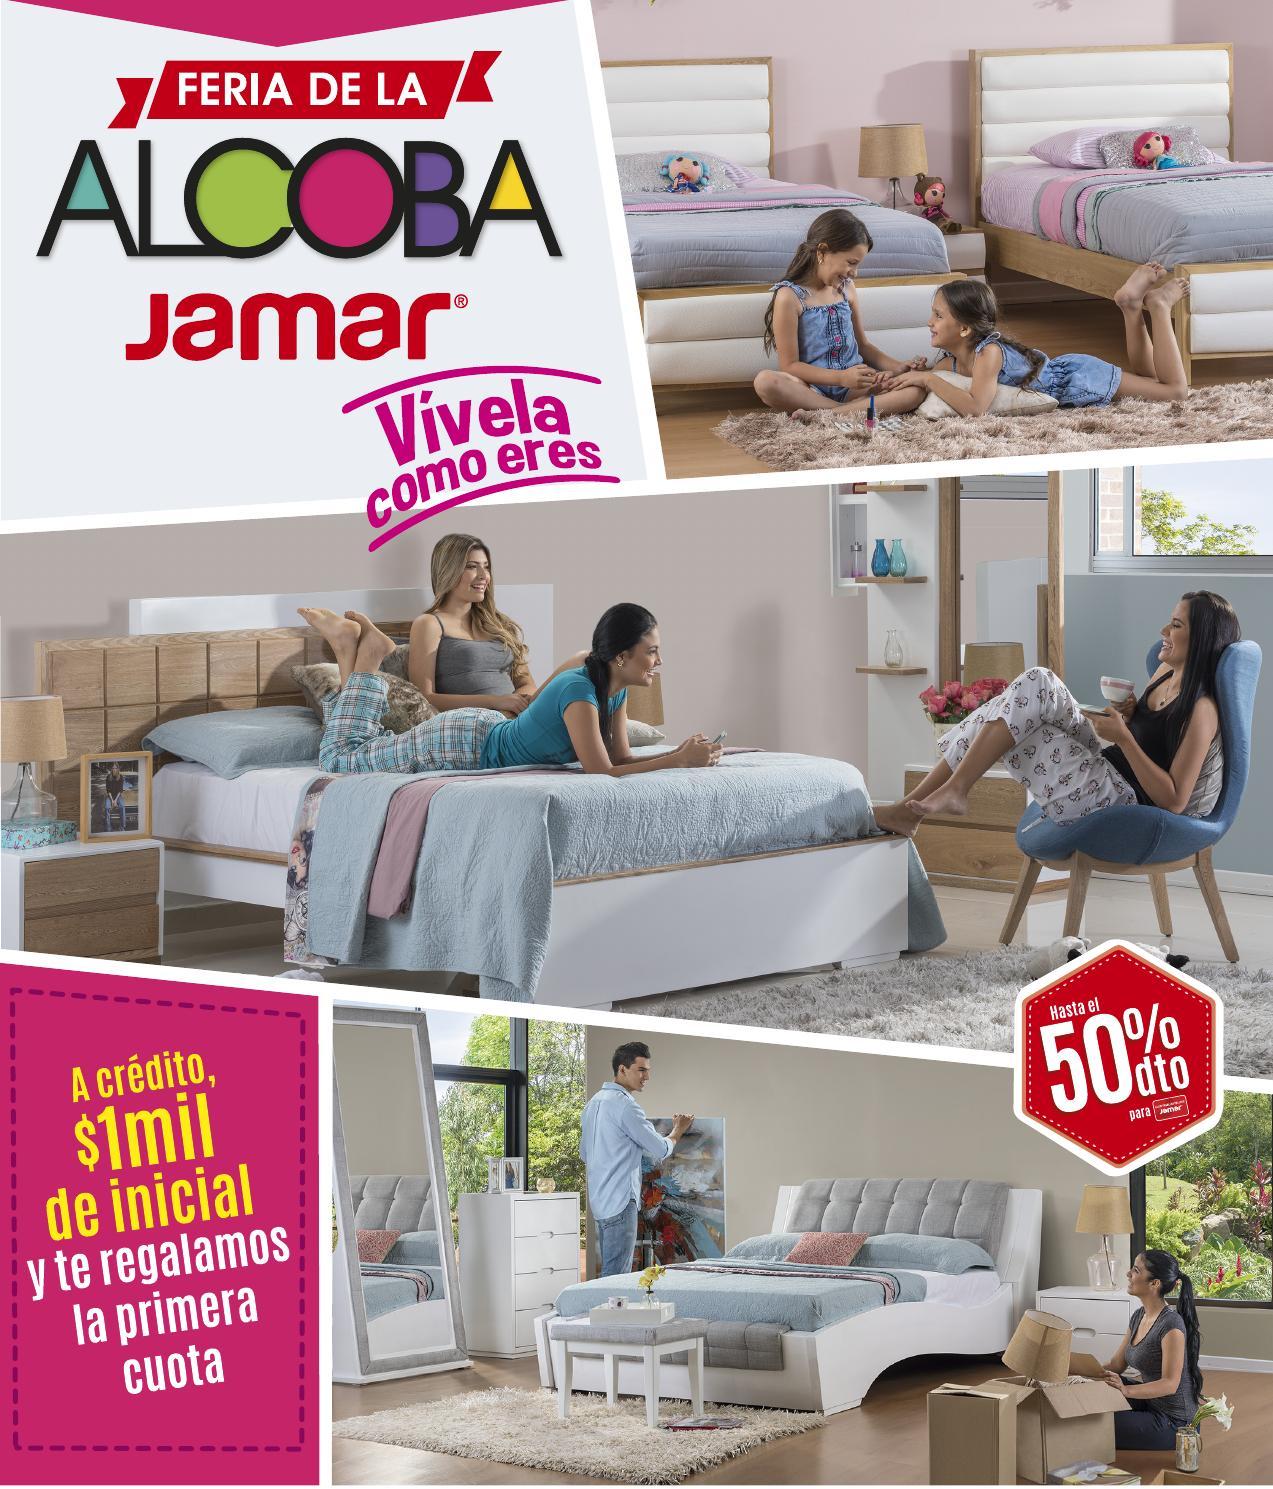 Cat logo feria de la alcoba jamar 2016 barranquilla by www for Mueble jamar